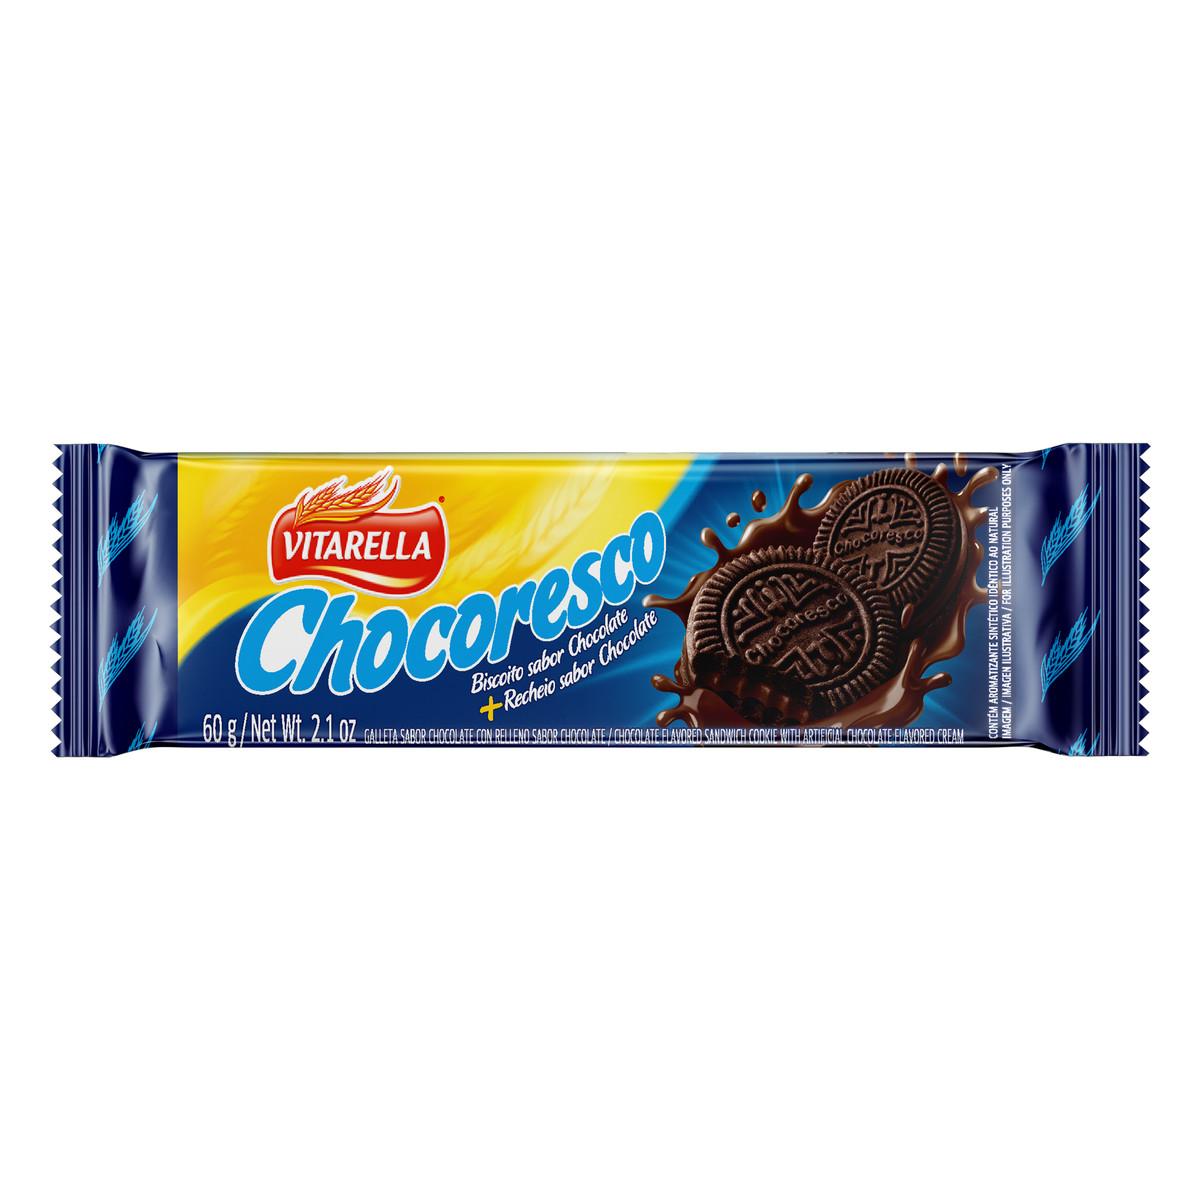 Biscoito recheado Chocoresco Chocolate 60g Vitarella pacote PCT